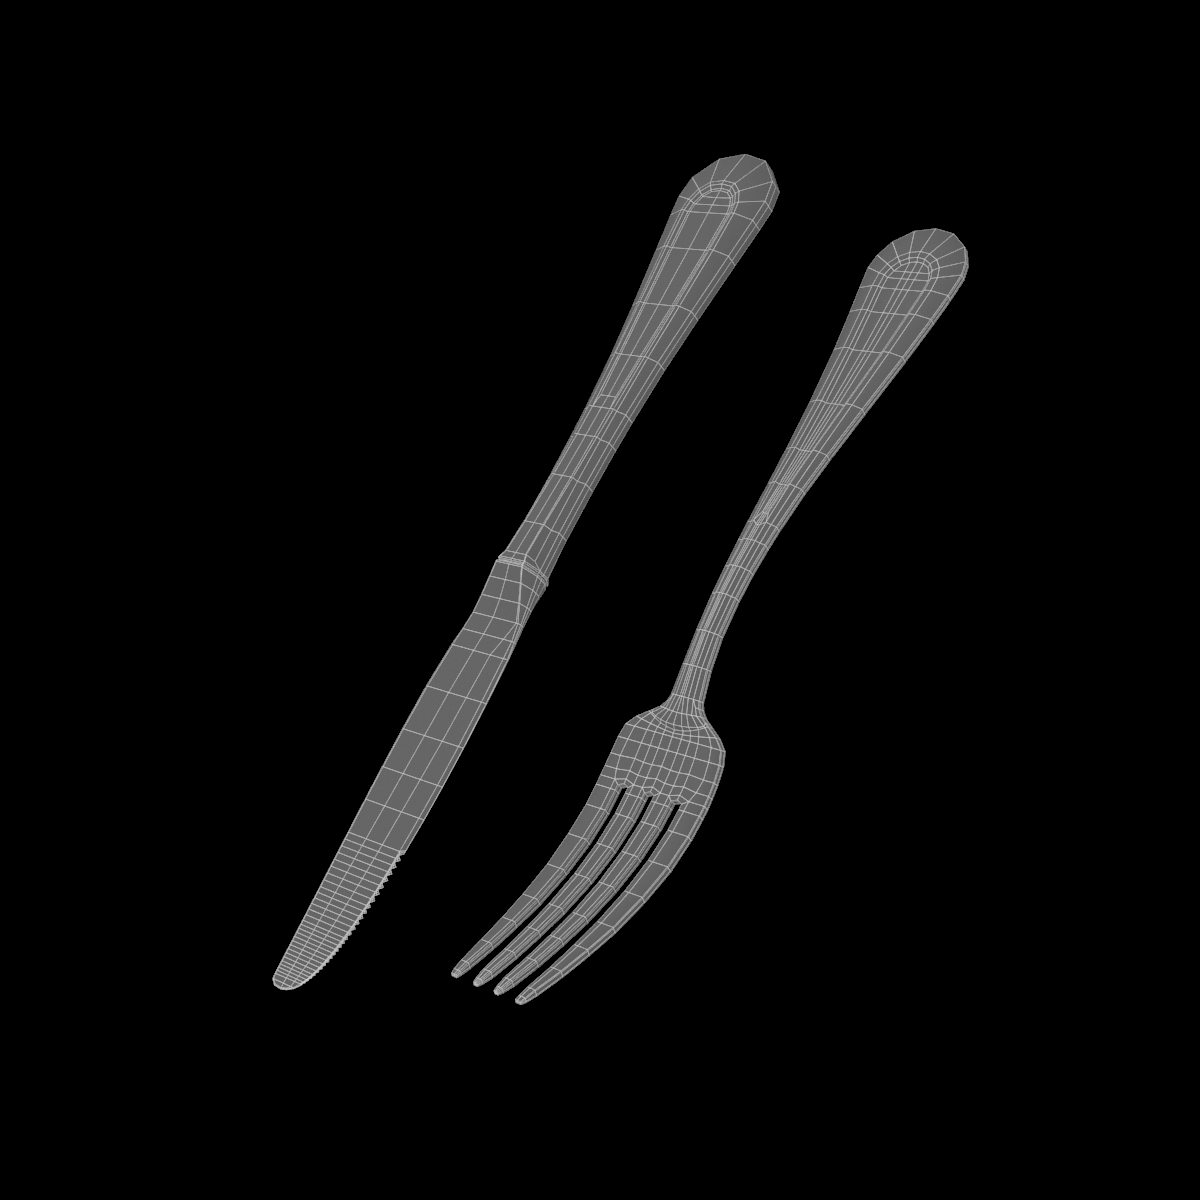 dessert knife and fork classic cutlery 3d model 3ds c4d fbx max max ma mb obj txt png stl 285930